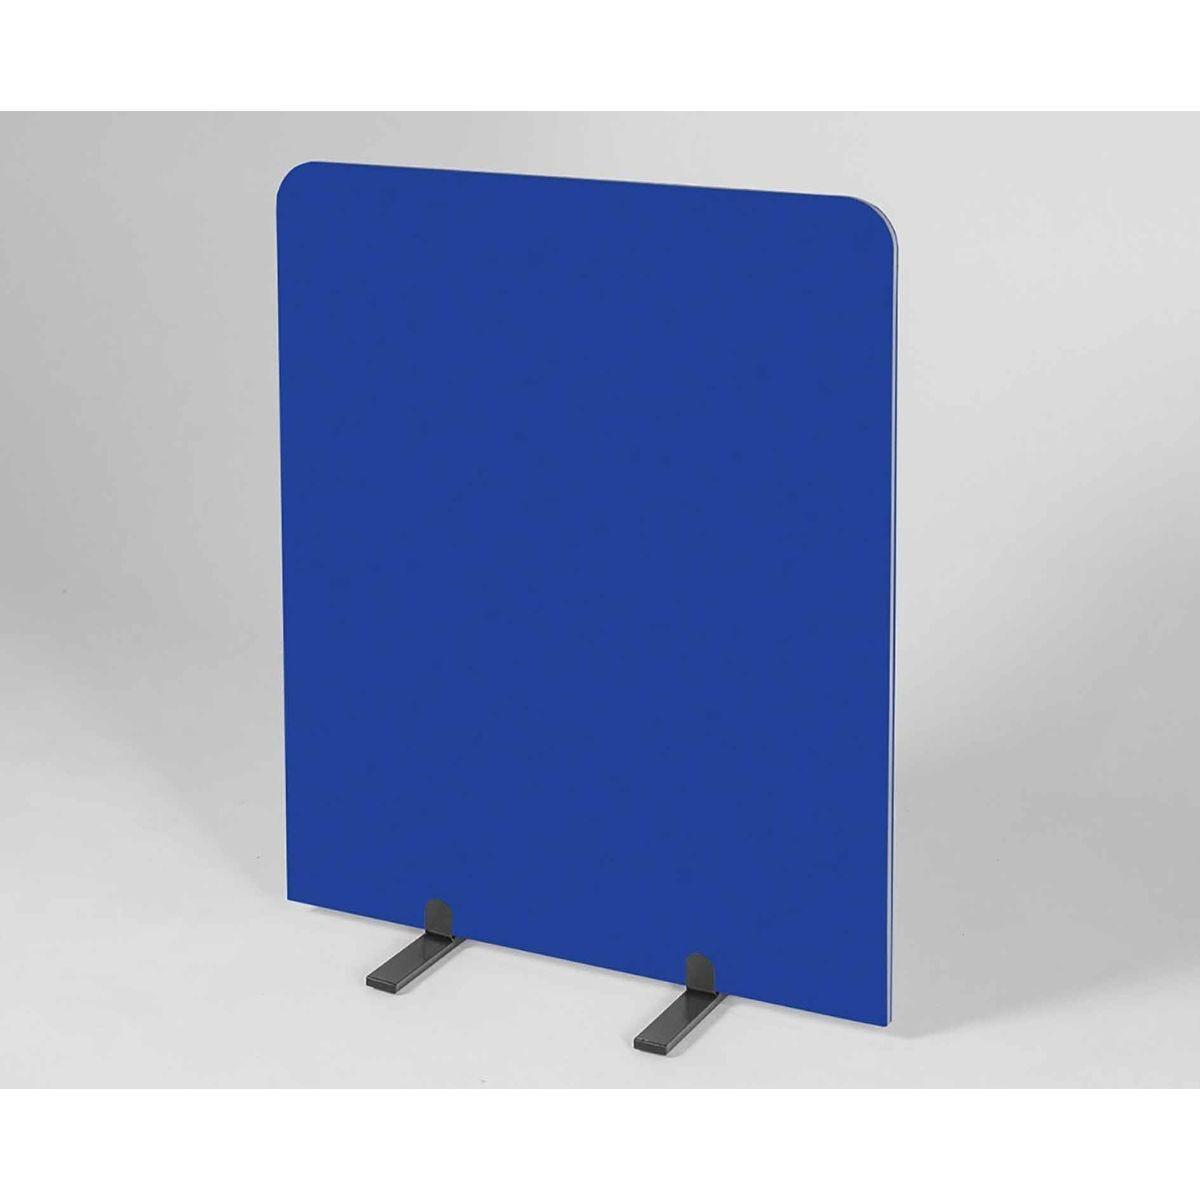 Metroplan BusyScreen Curve Screen 1450 x 1200mm Royal Blue